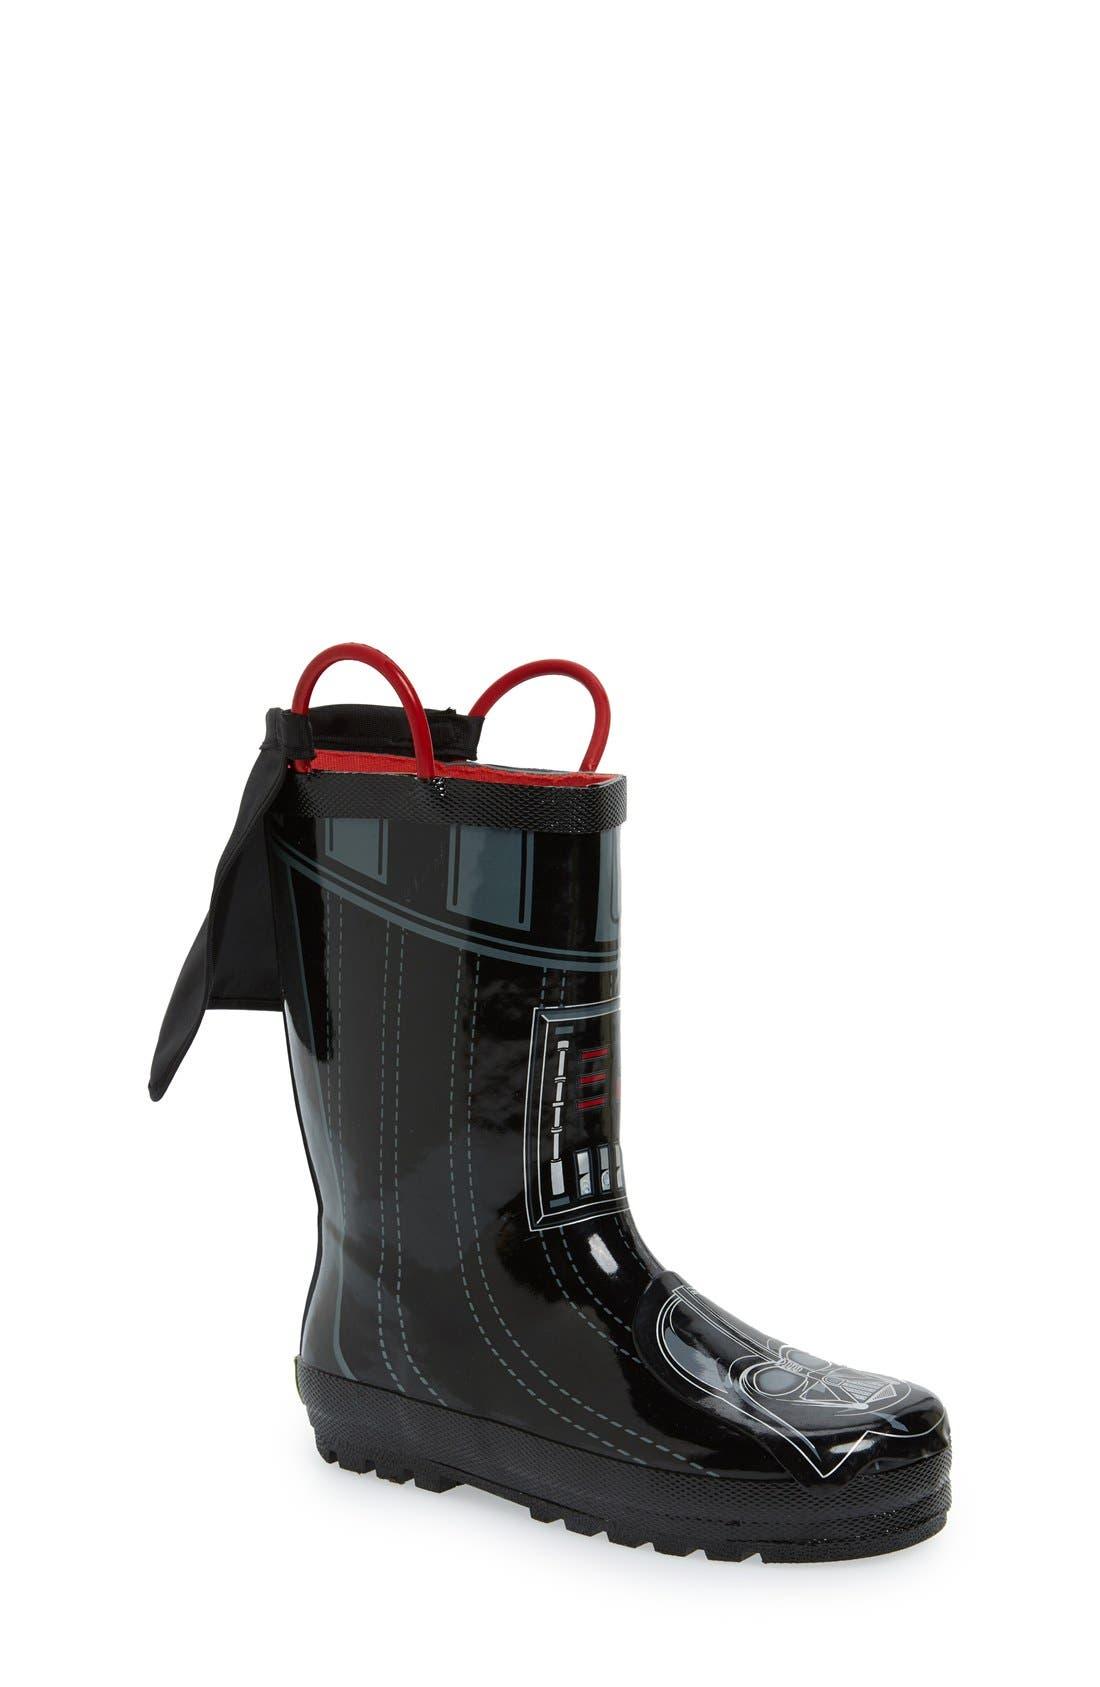 'Star Wars<sup>™</sup> - Darth Vader' Waterproof Rain Boot,                         Main,                         color, Black